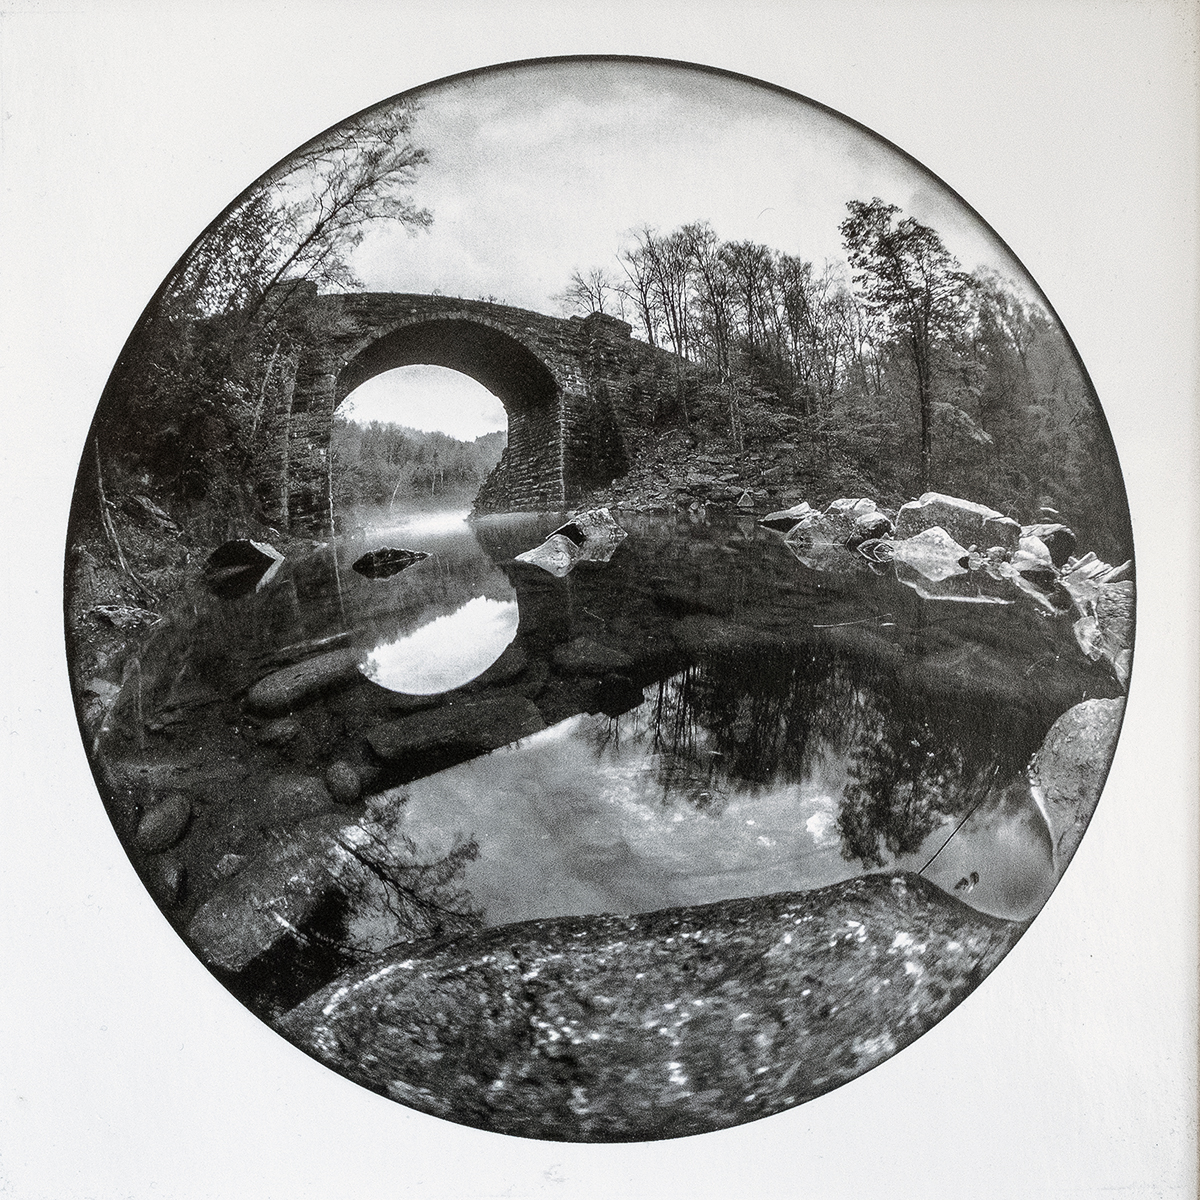 Whistler's Arch